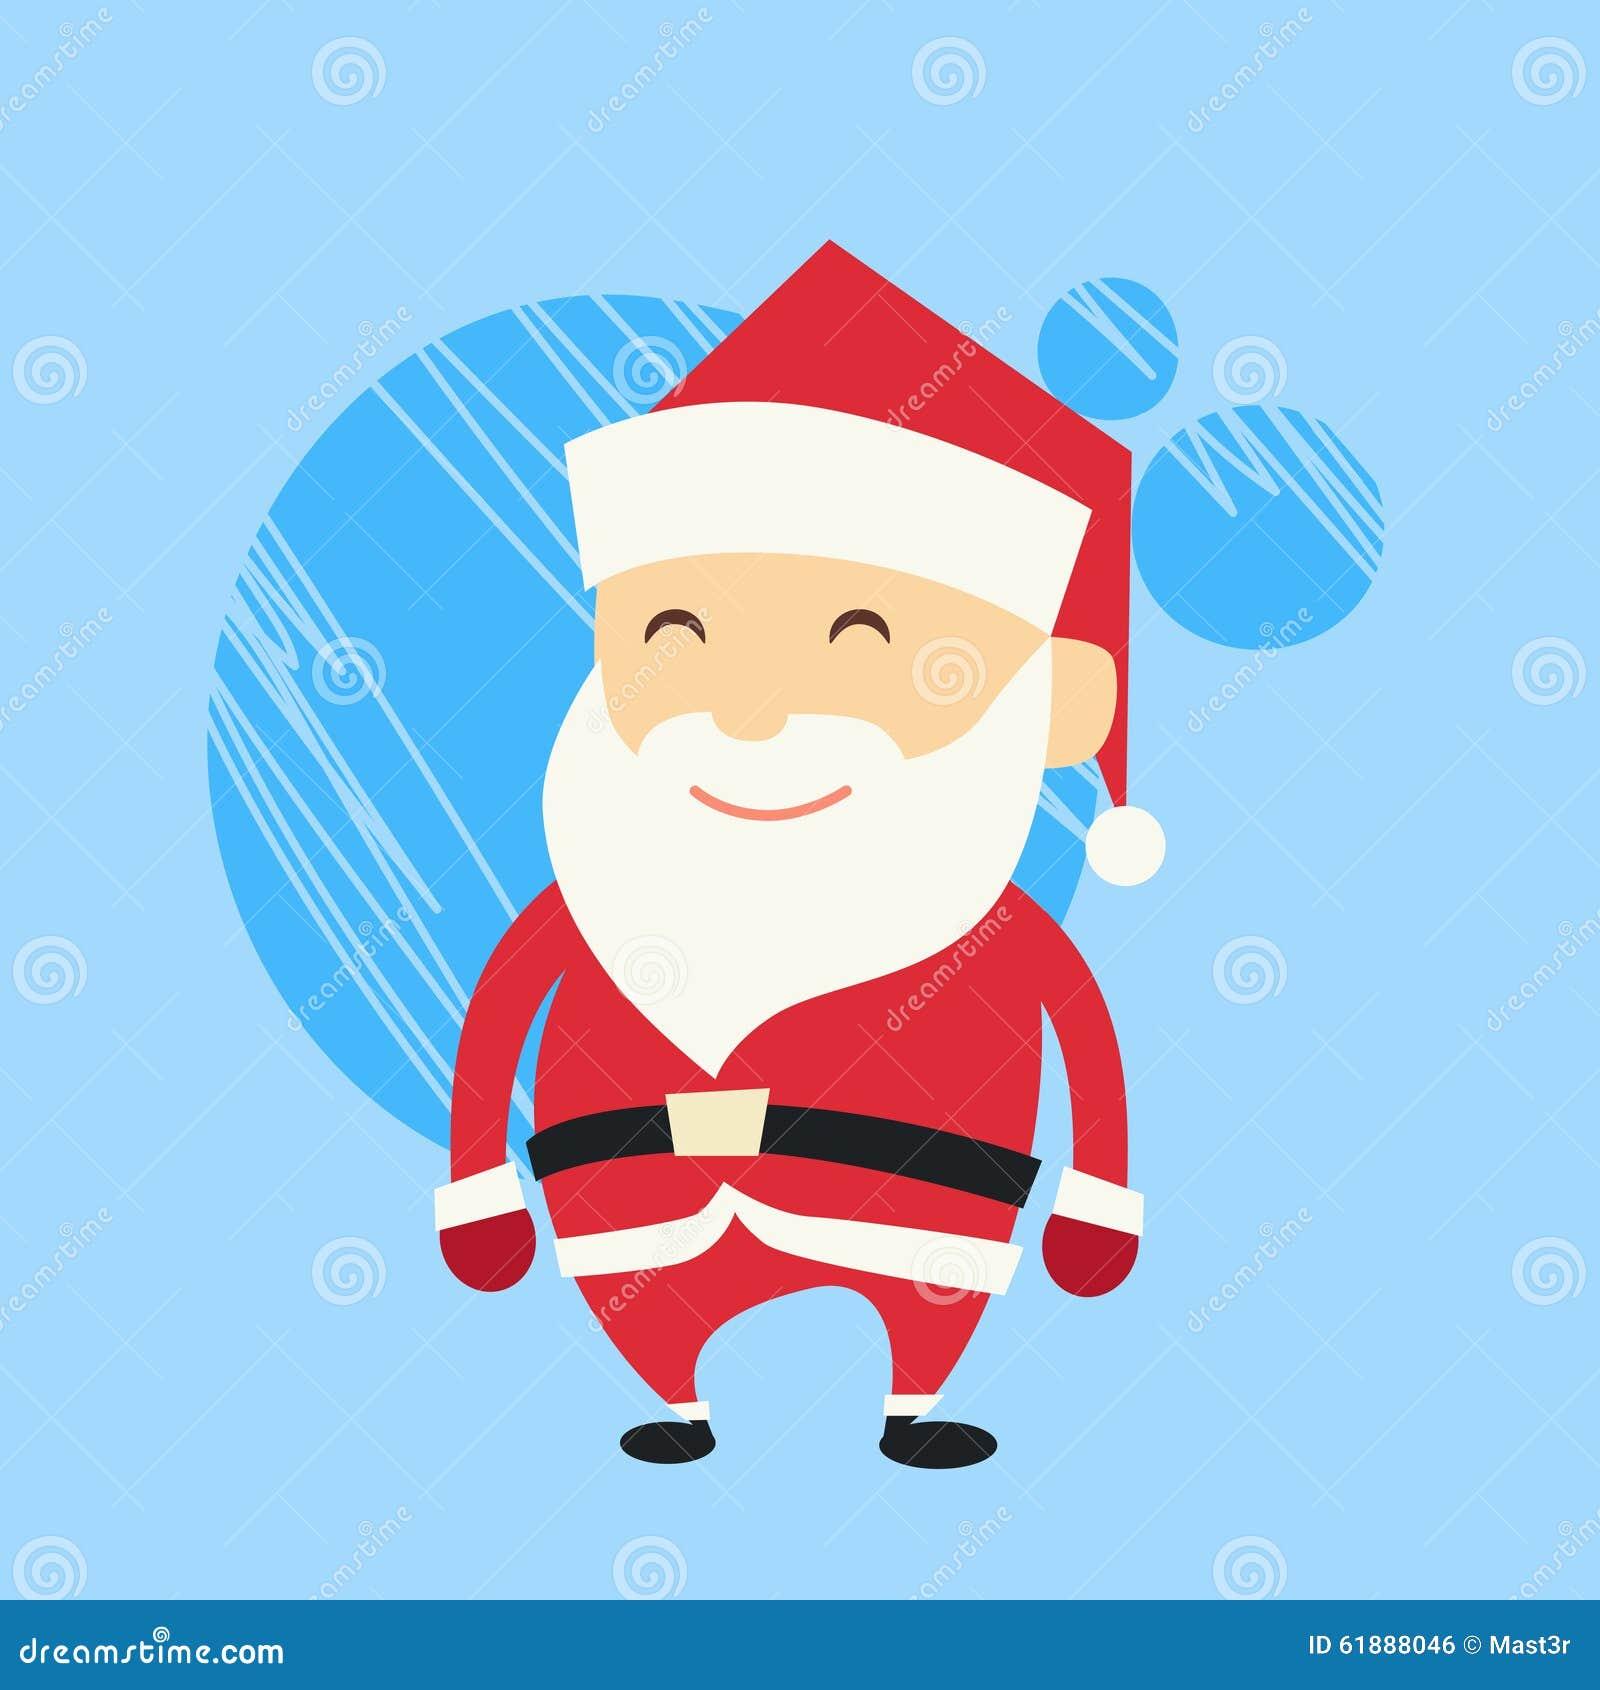 Santa Claus Cartoon Flat Christmas Holiday Vektor Abbildung ...